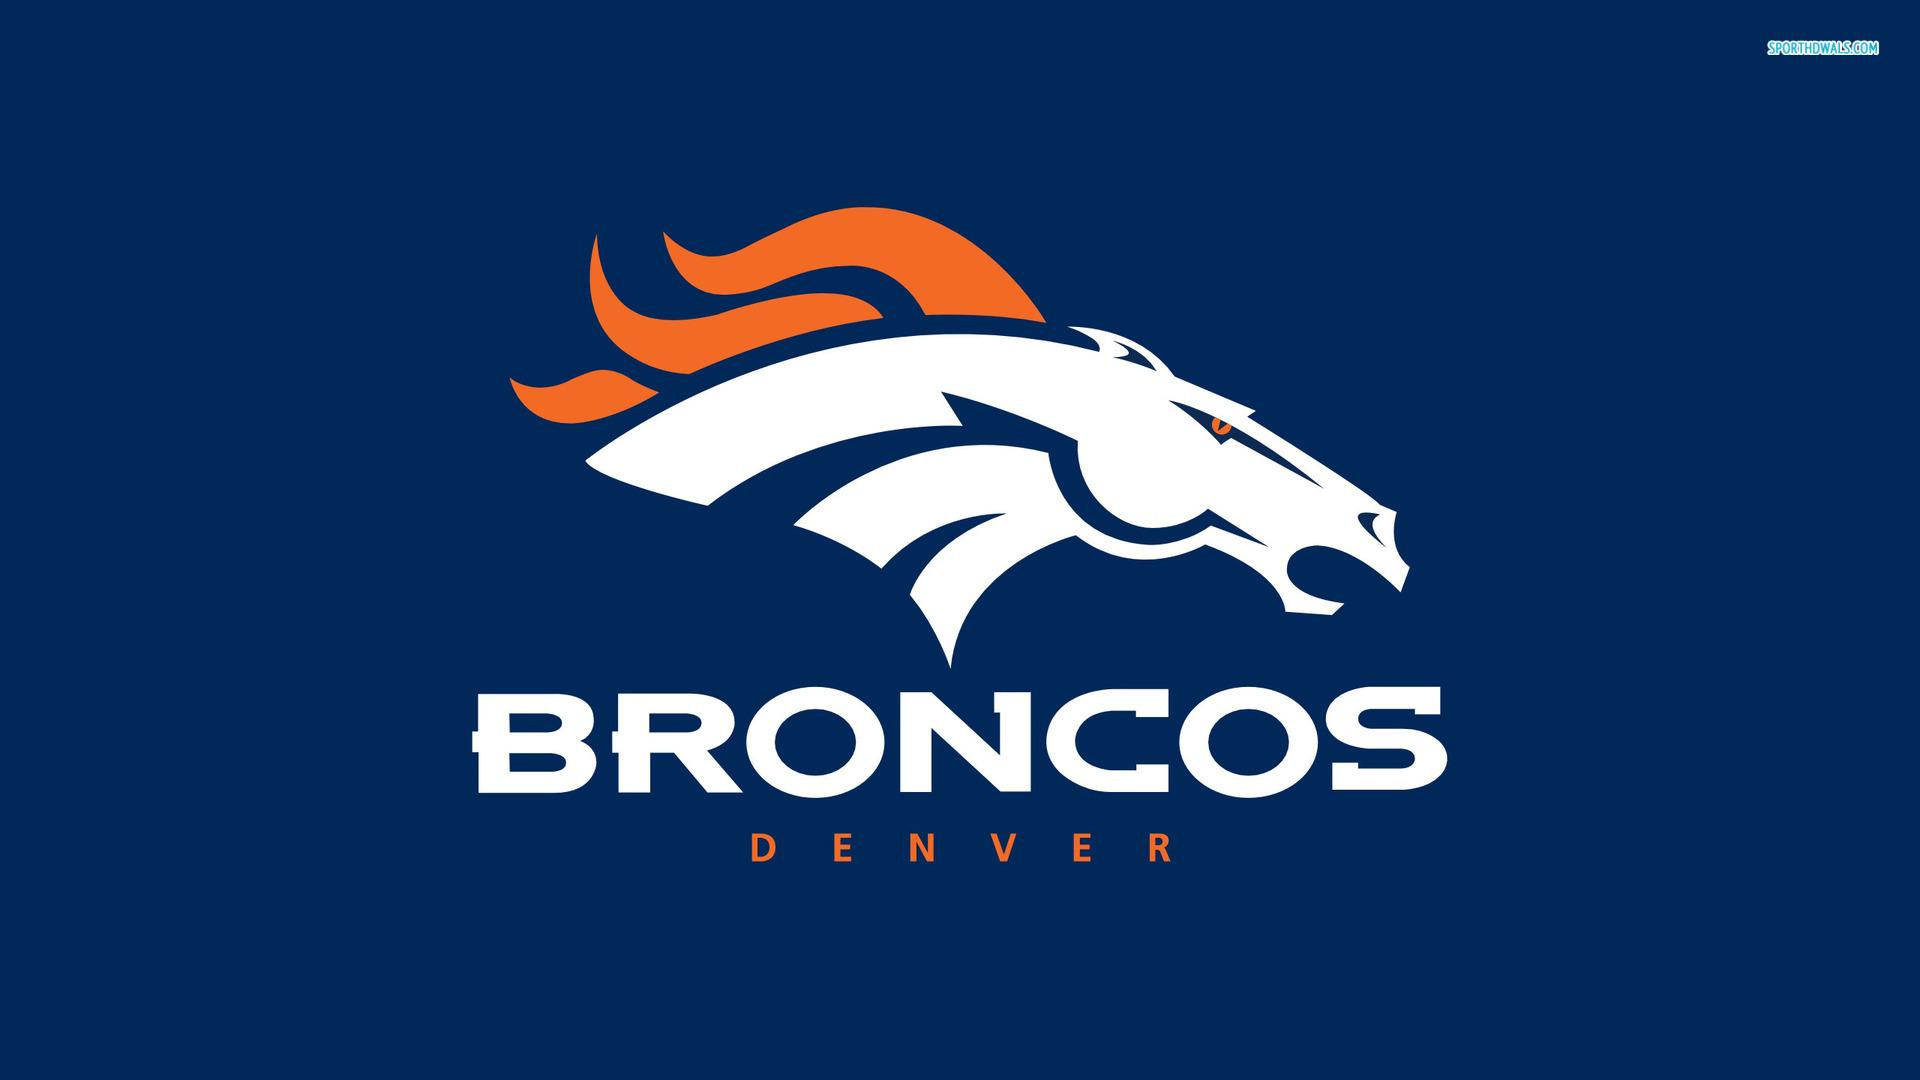 19+ Broncos De Denver Wallpaper Hd Gif